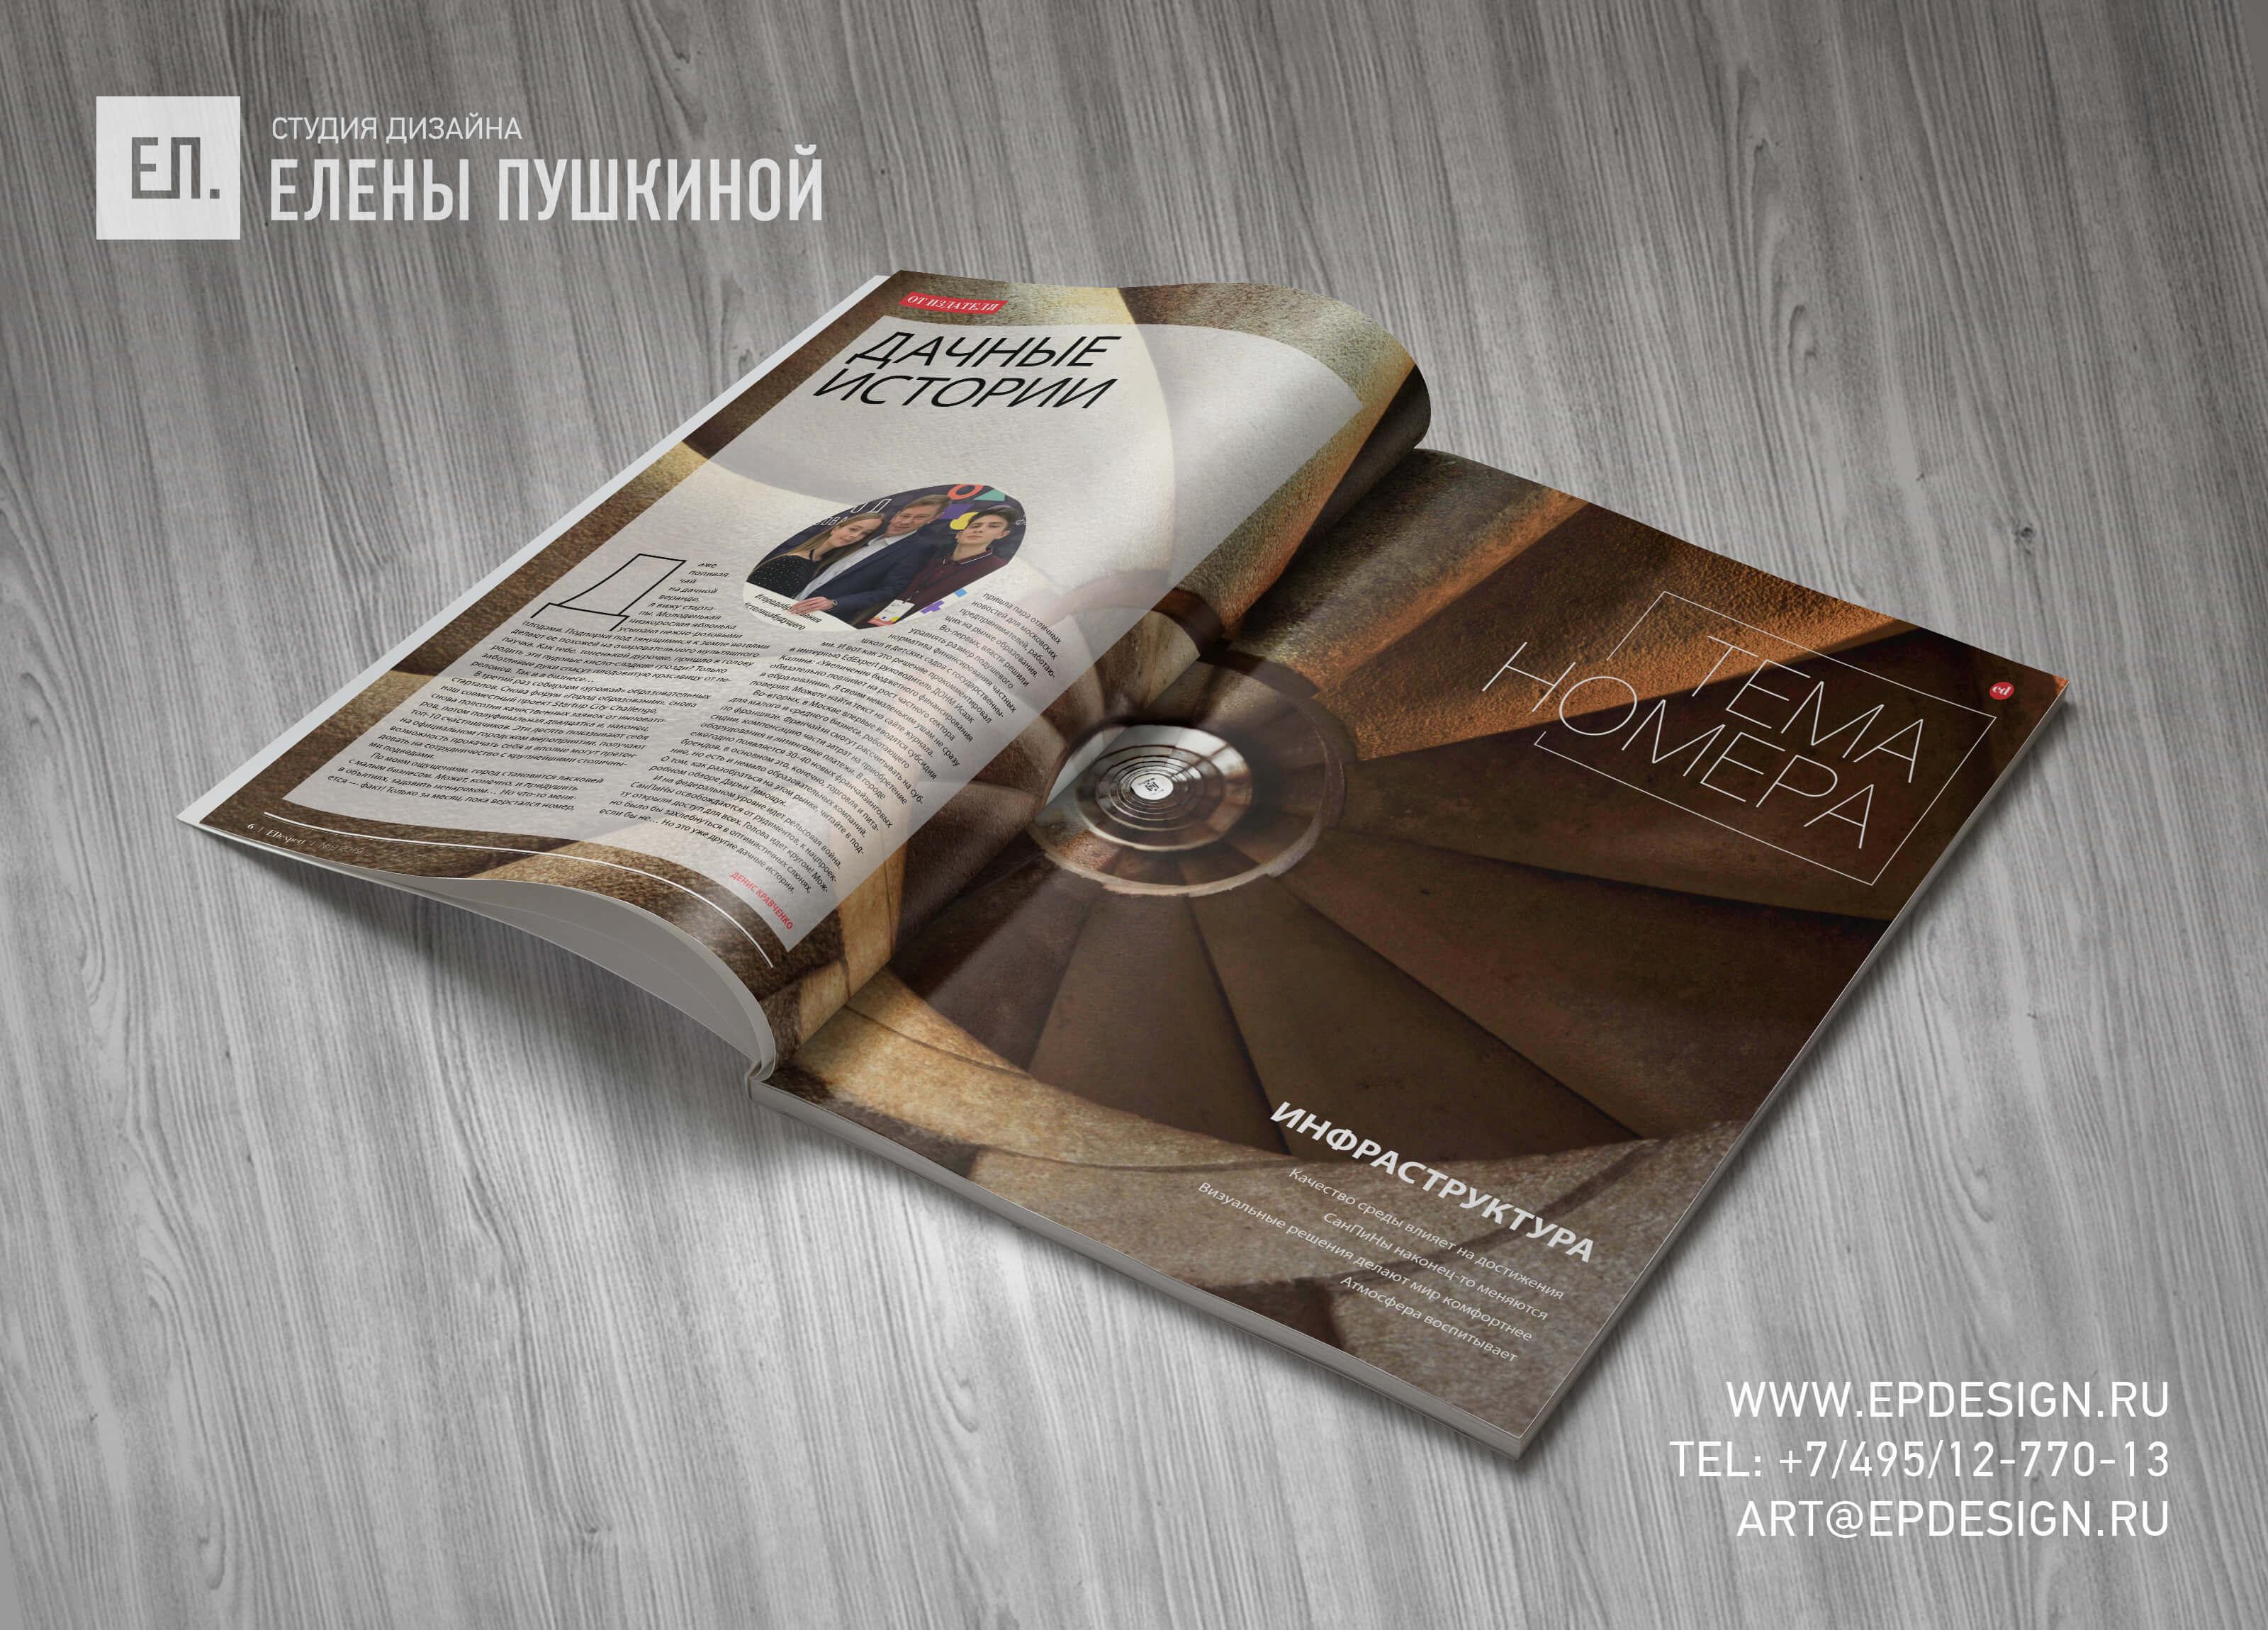 Журнал «EDexpert» №9 август 2019 — разработка с «нуля» логотипа, обложки, макета и вёрстка журнала Разработка журналов Портфолио